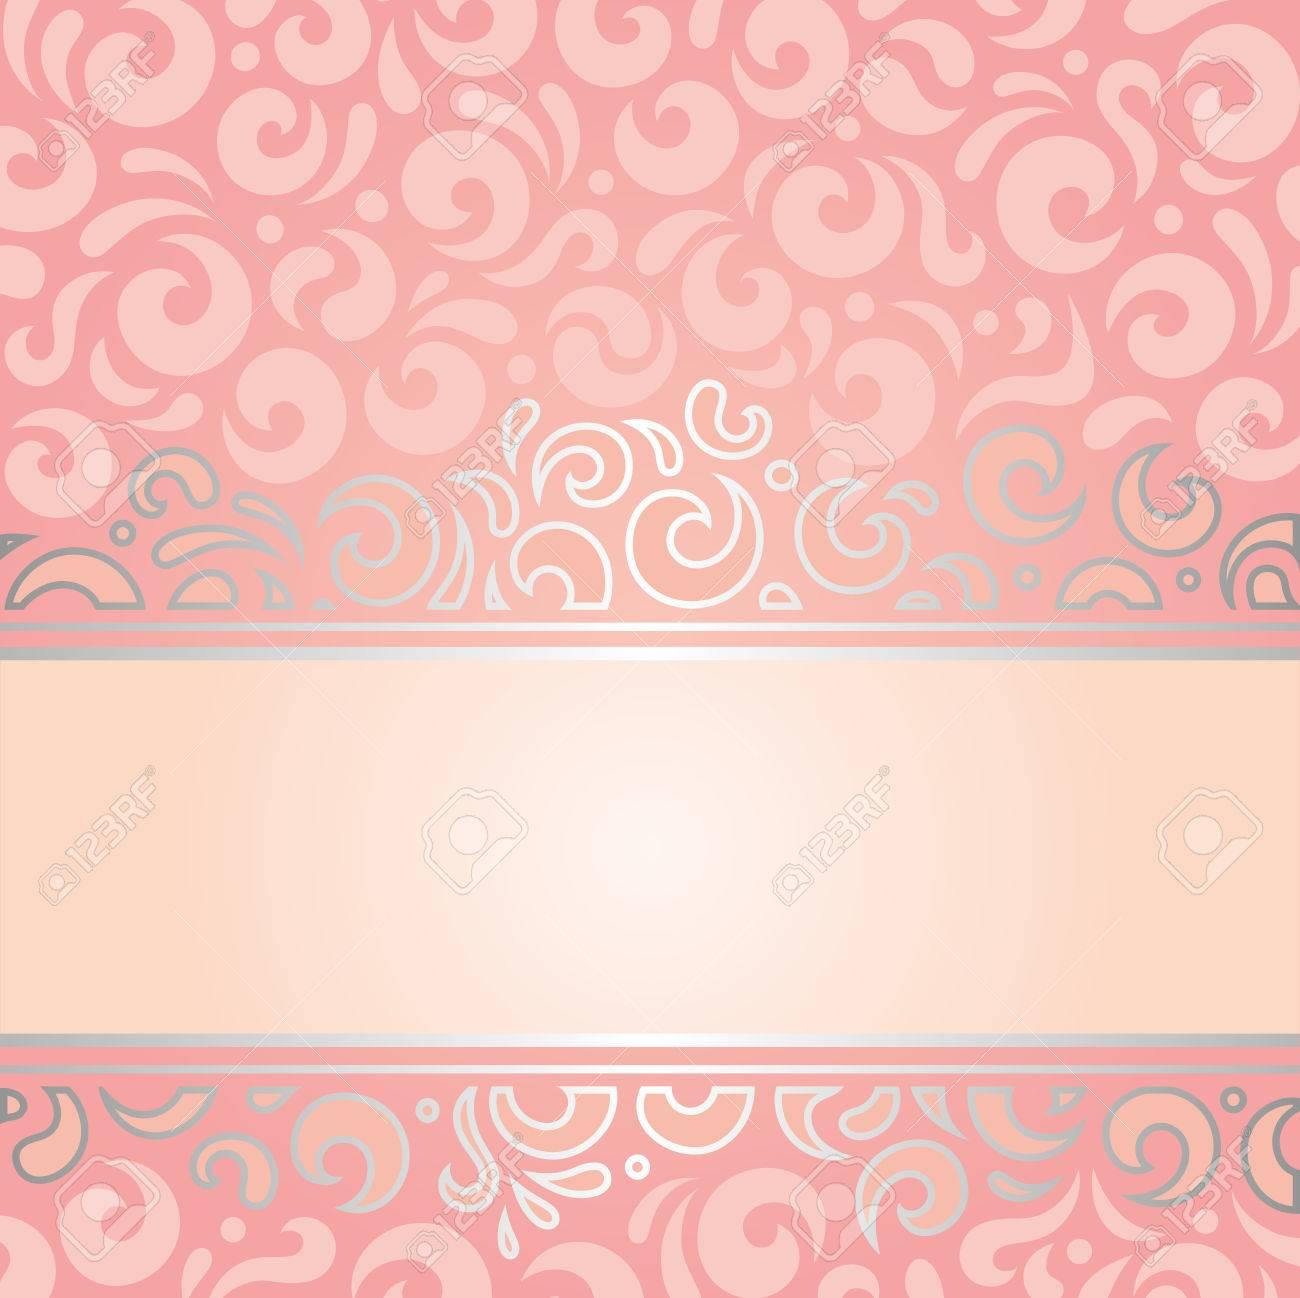 Retro Decorative Pink Silver Invitation Background Vintage Wallpaper